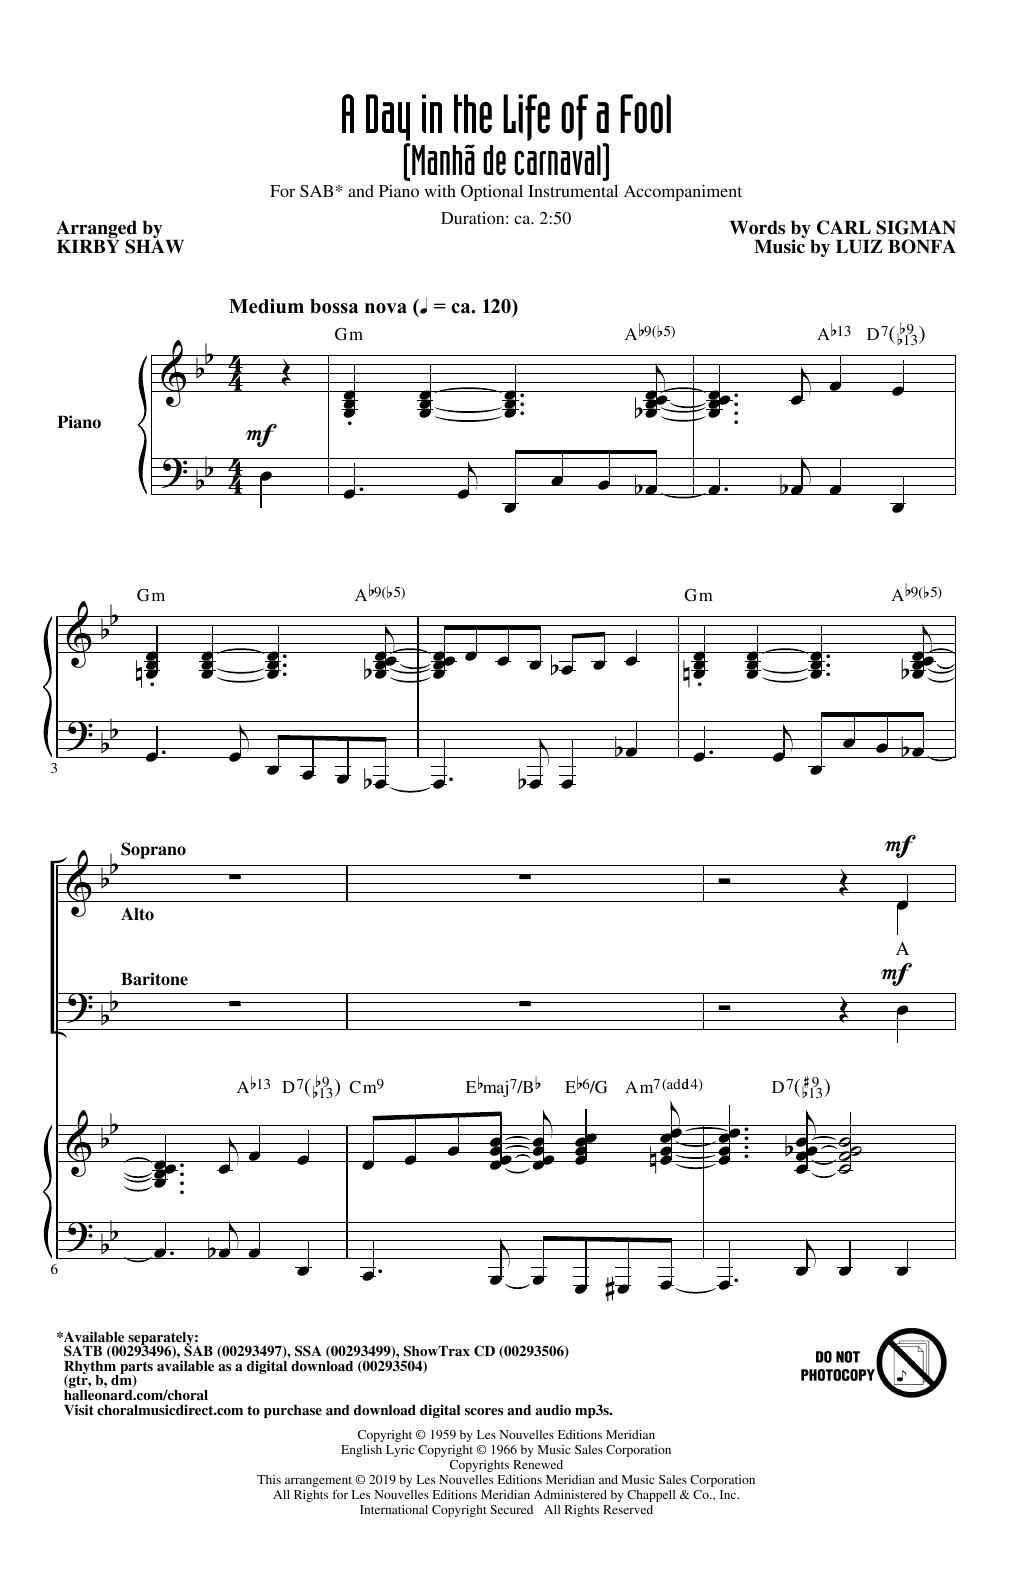 A Day In The Life Of A Fool (Manha De Carnaval) (arr. Kirby Shaw) (SAB Choir)